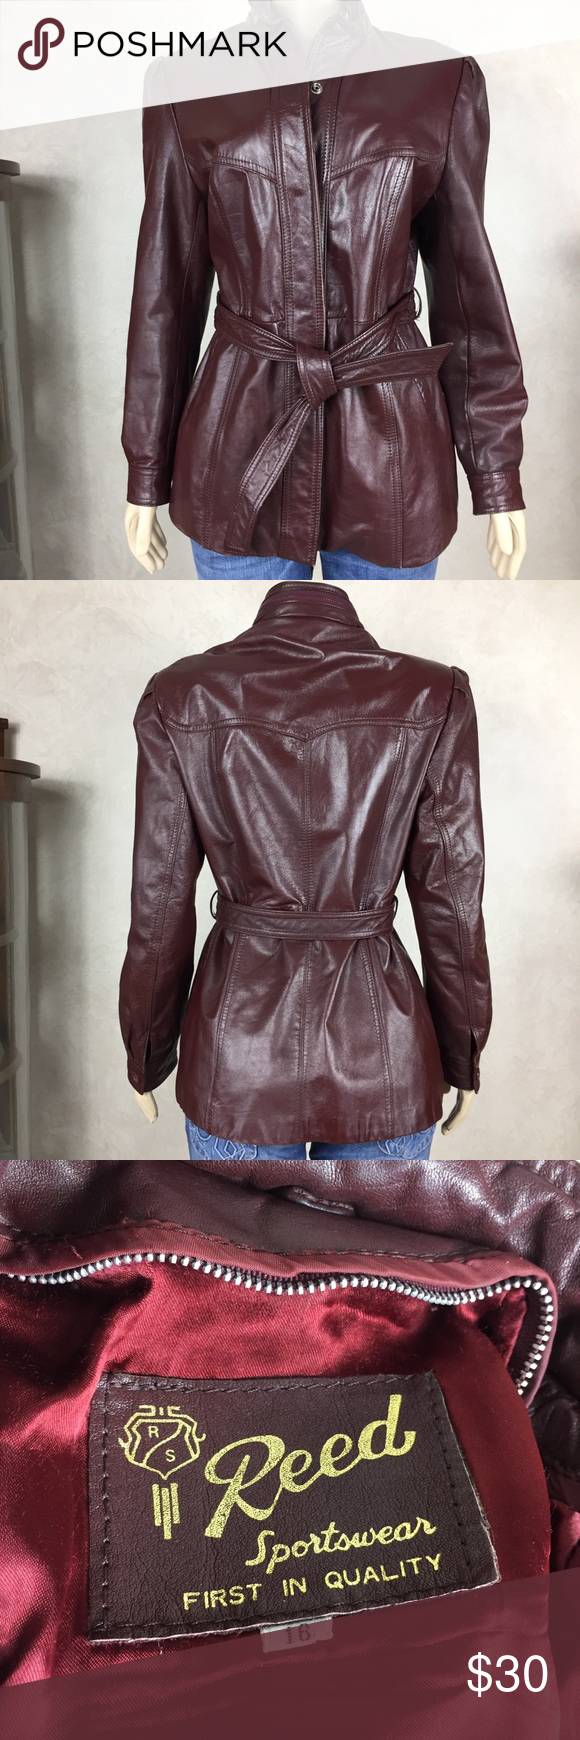 Vintage Reed Red Leather Jacket Leather Jacket Vintage Leather Jacket Red Leather Jacket [ 1740 x 580 Pixel ]